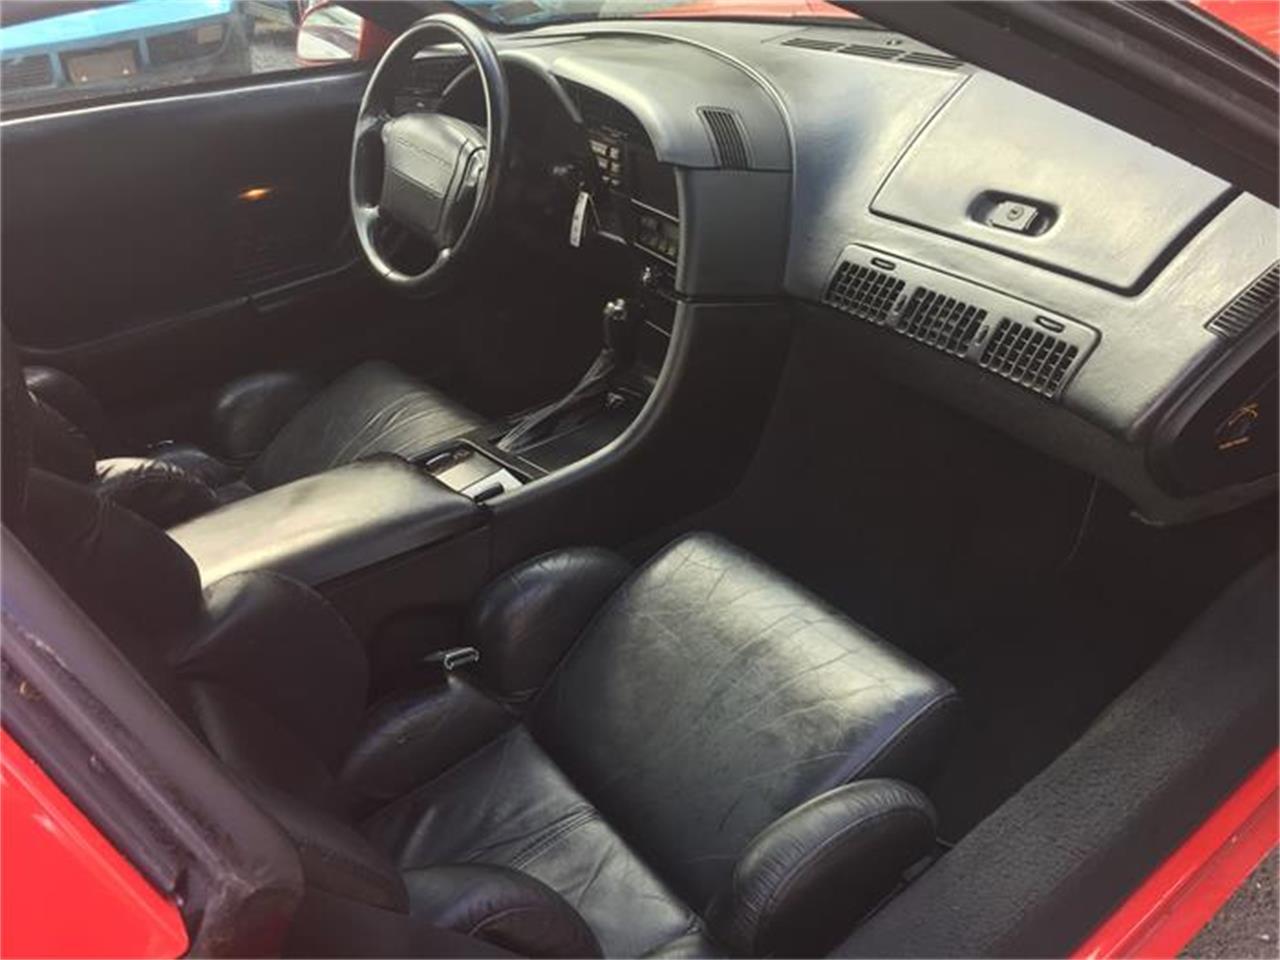 Large Picture of 1992 Chevrolet Corvette located in Pennsylvania - $8,500.00 - I0FG